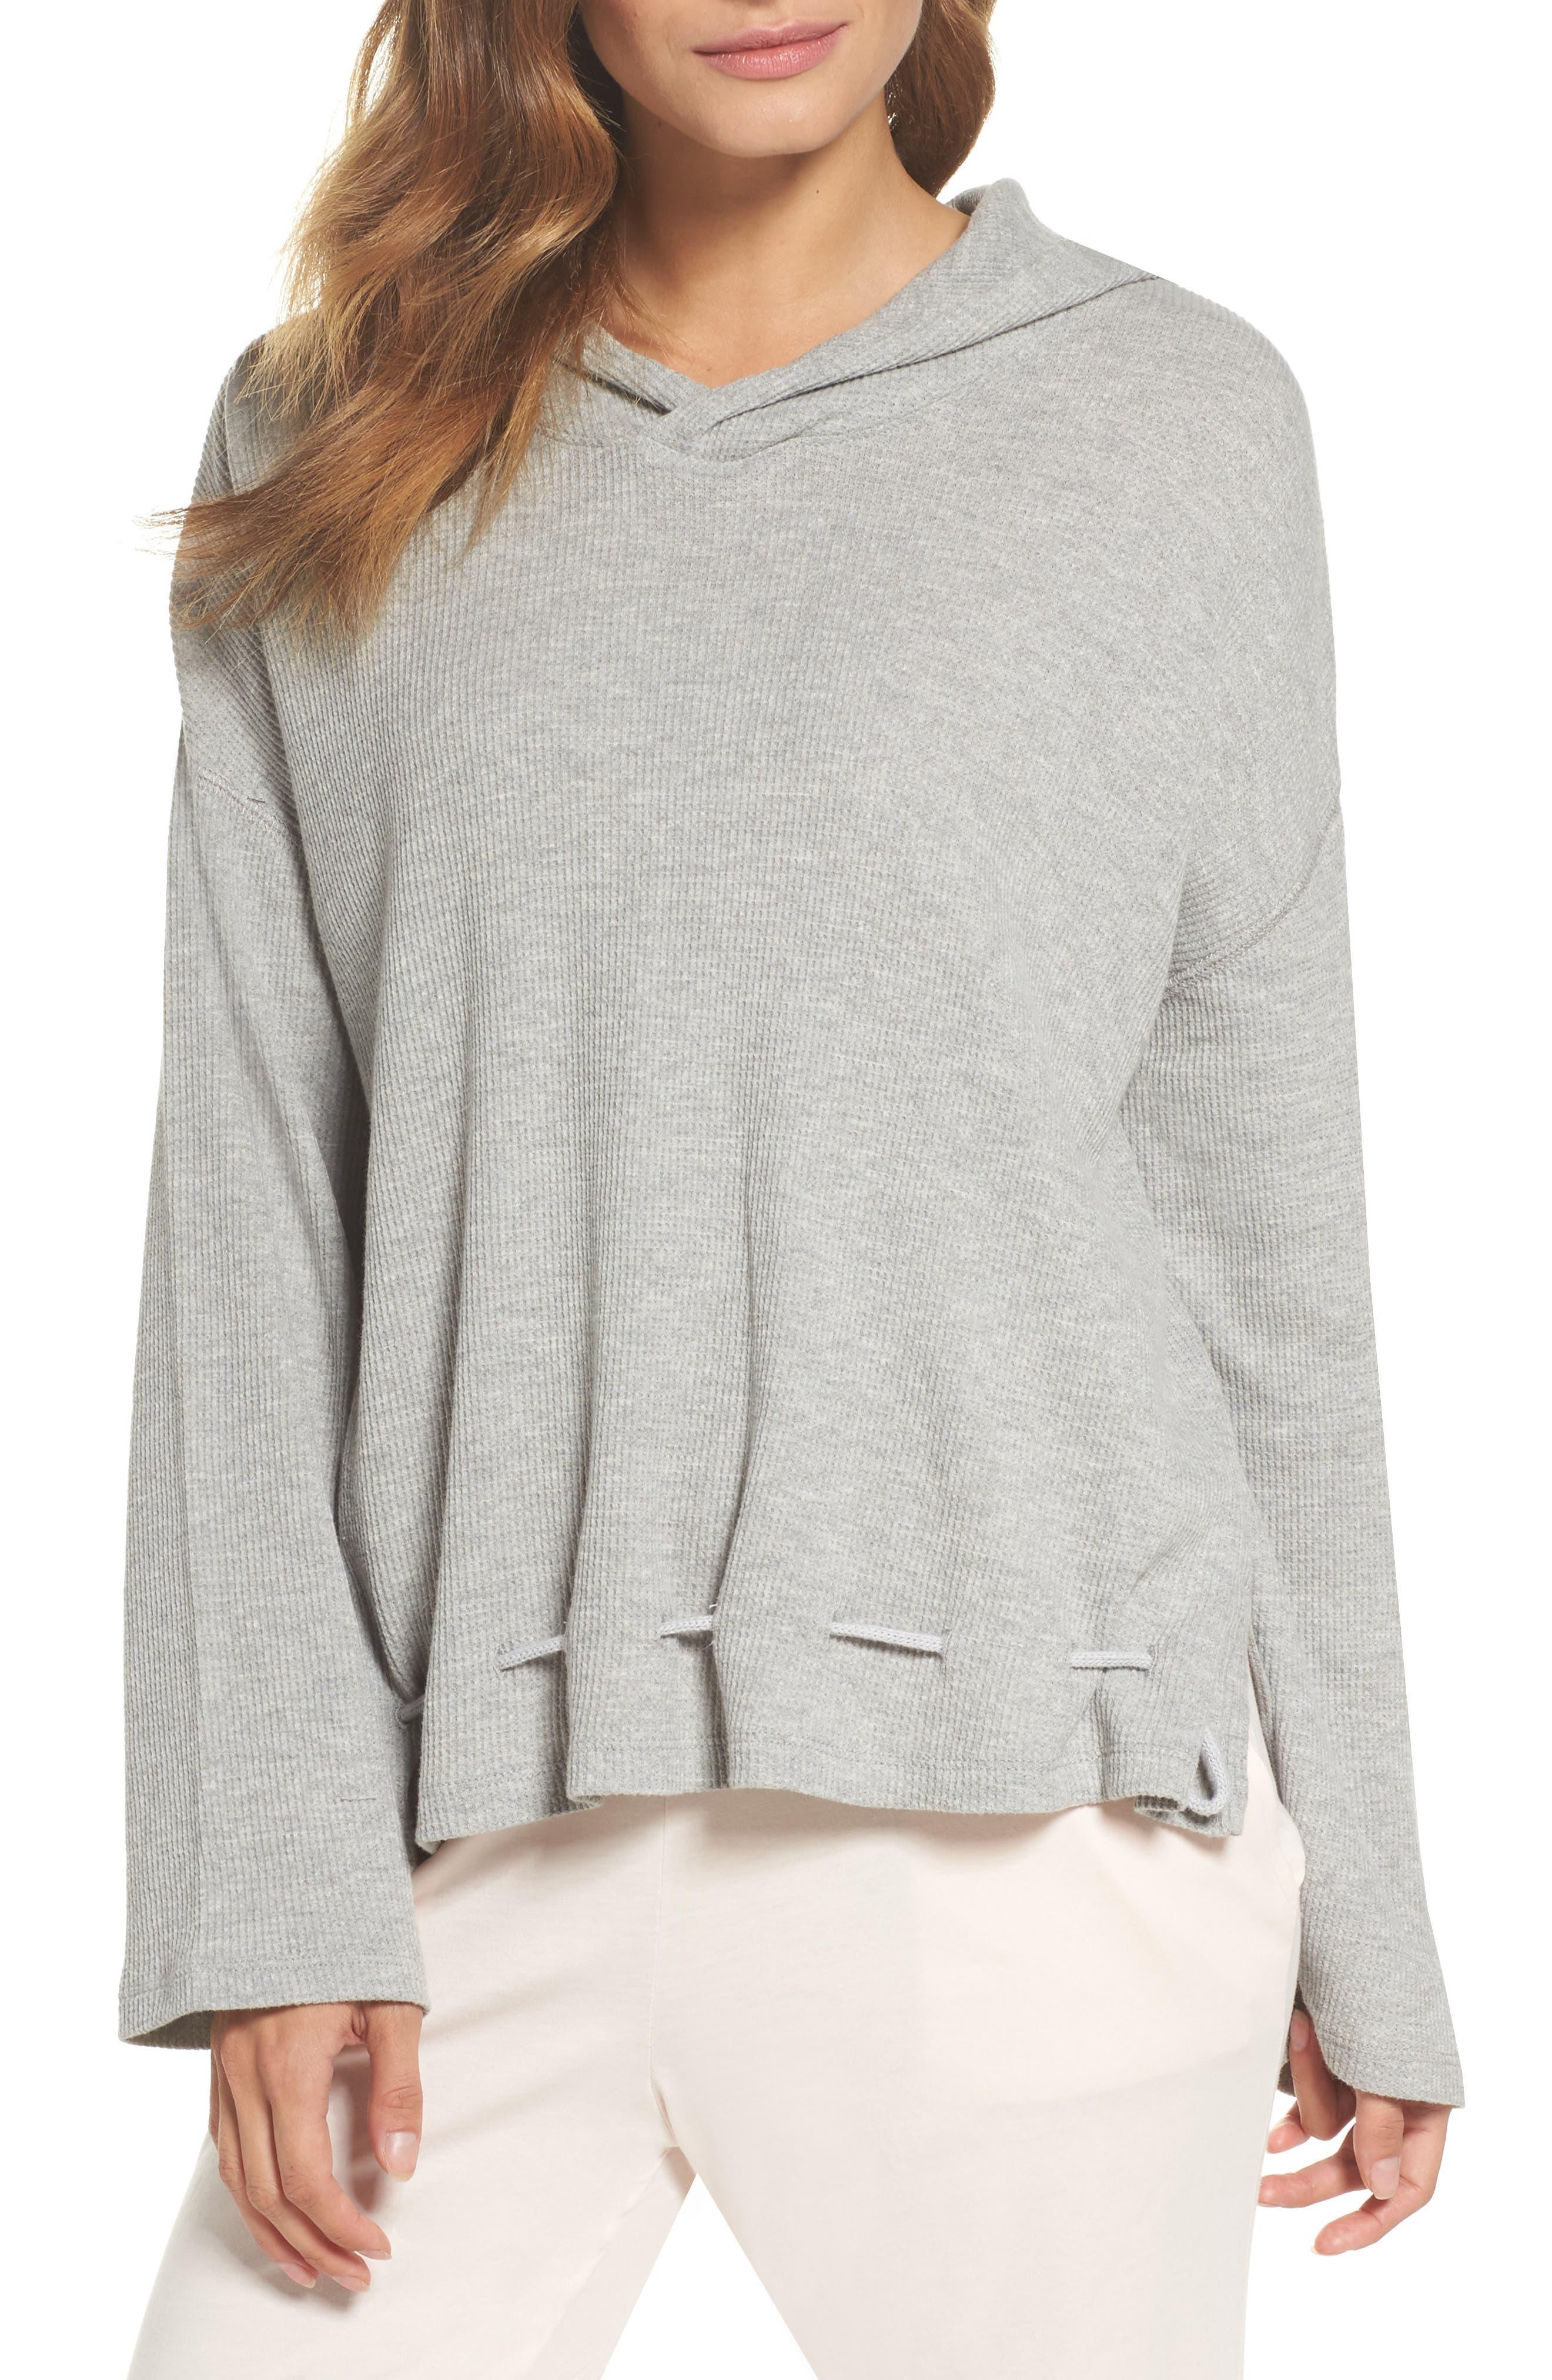 Main Image - skin Thermal Hooded Top